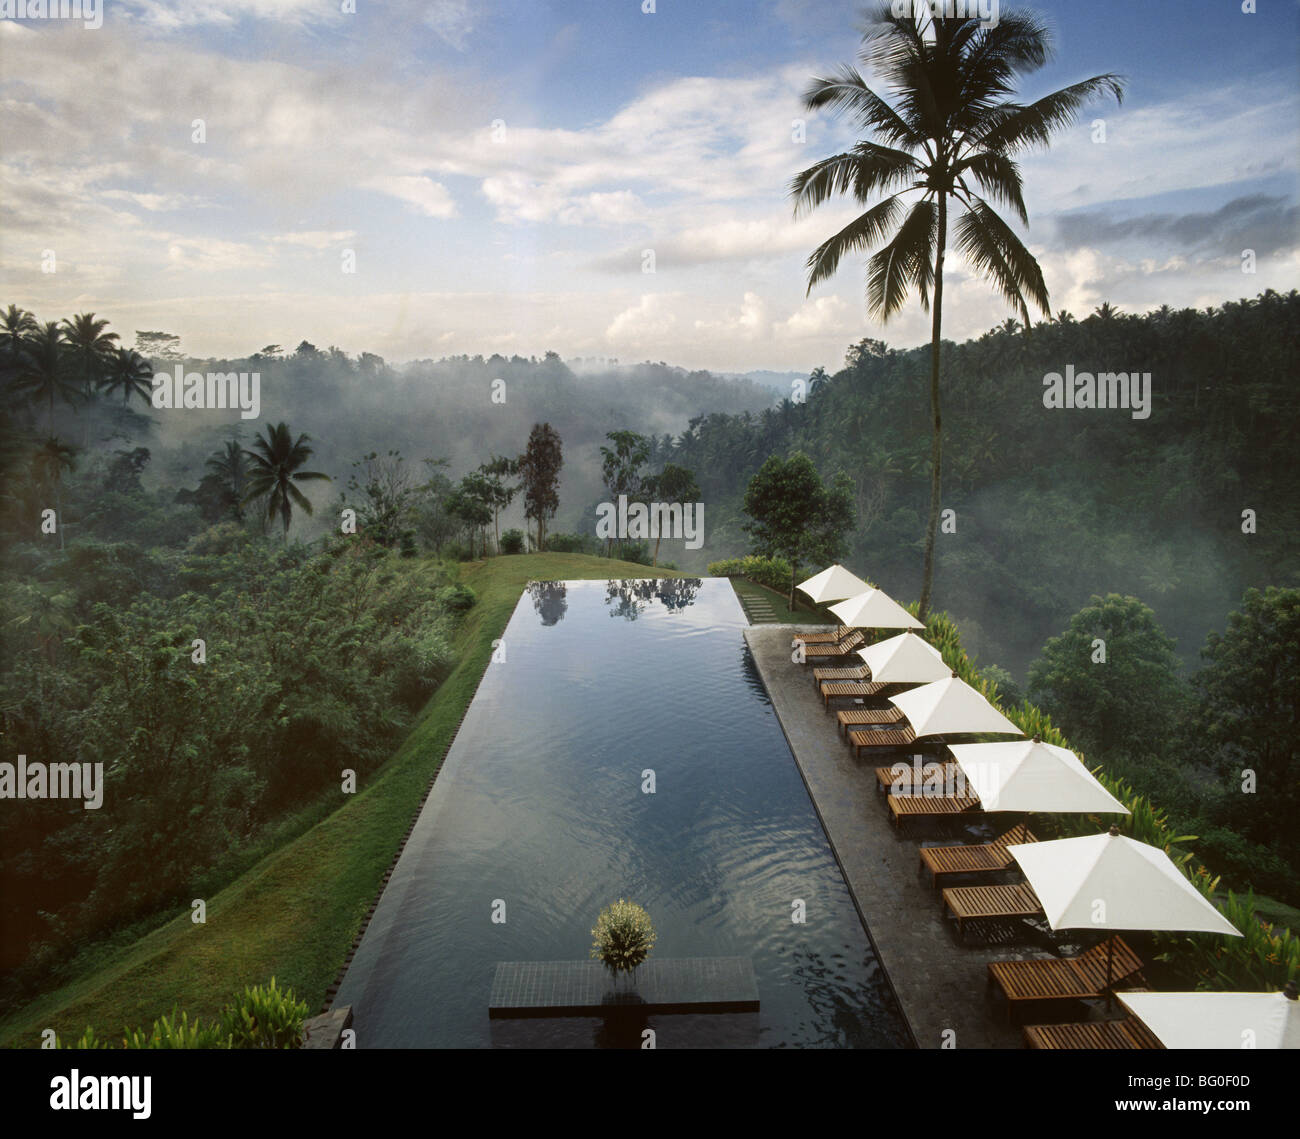 Pool of Alila Hotel Ubud, formerly The Chedi, Ubud, Bali, Indonesia, Southeast Asia, Asia - Stock Image